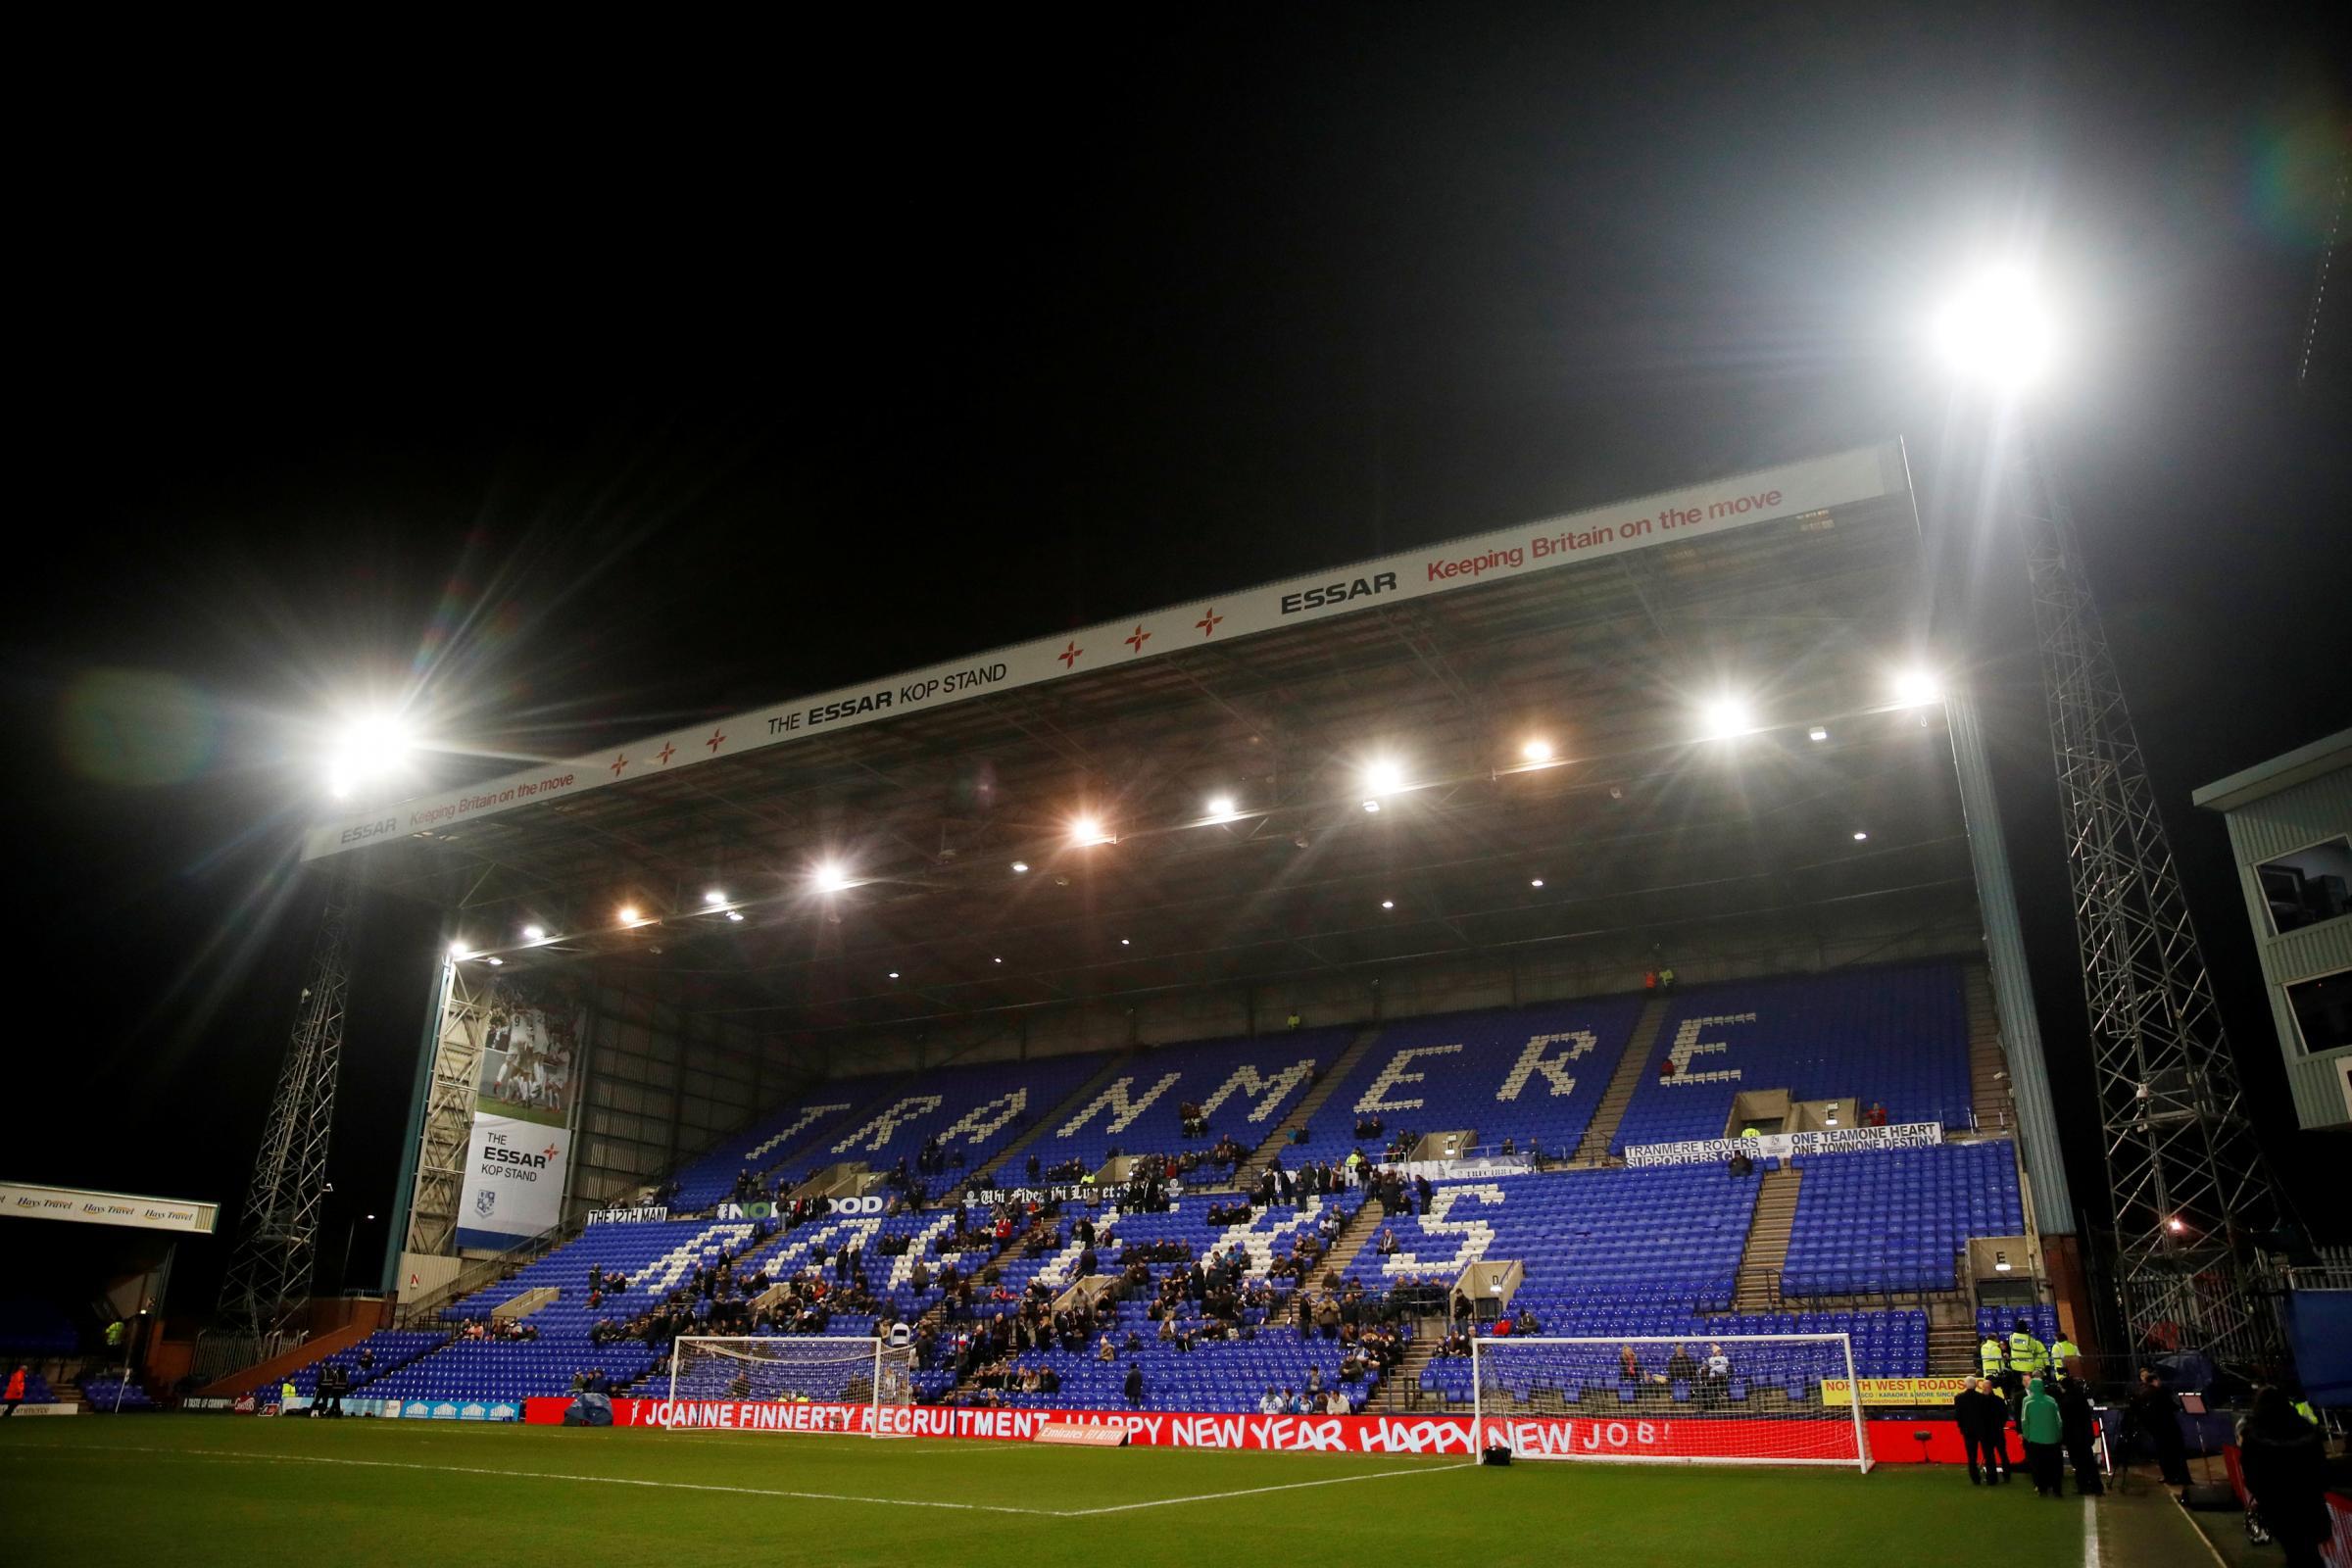 Watford's FA Cup replay at Tranmere Rovers postponed